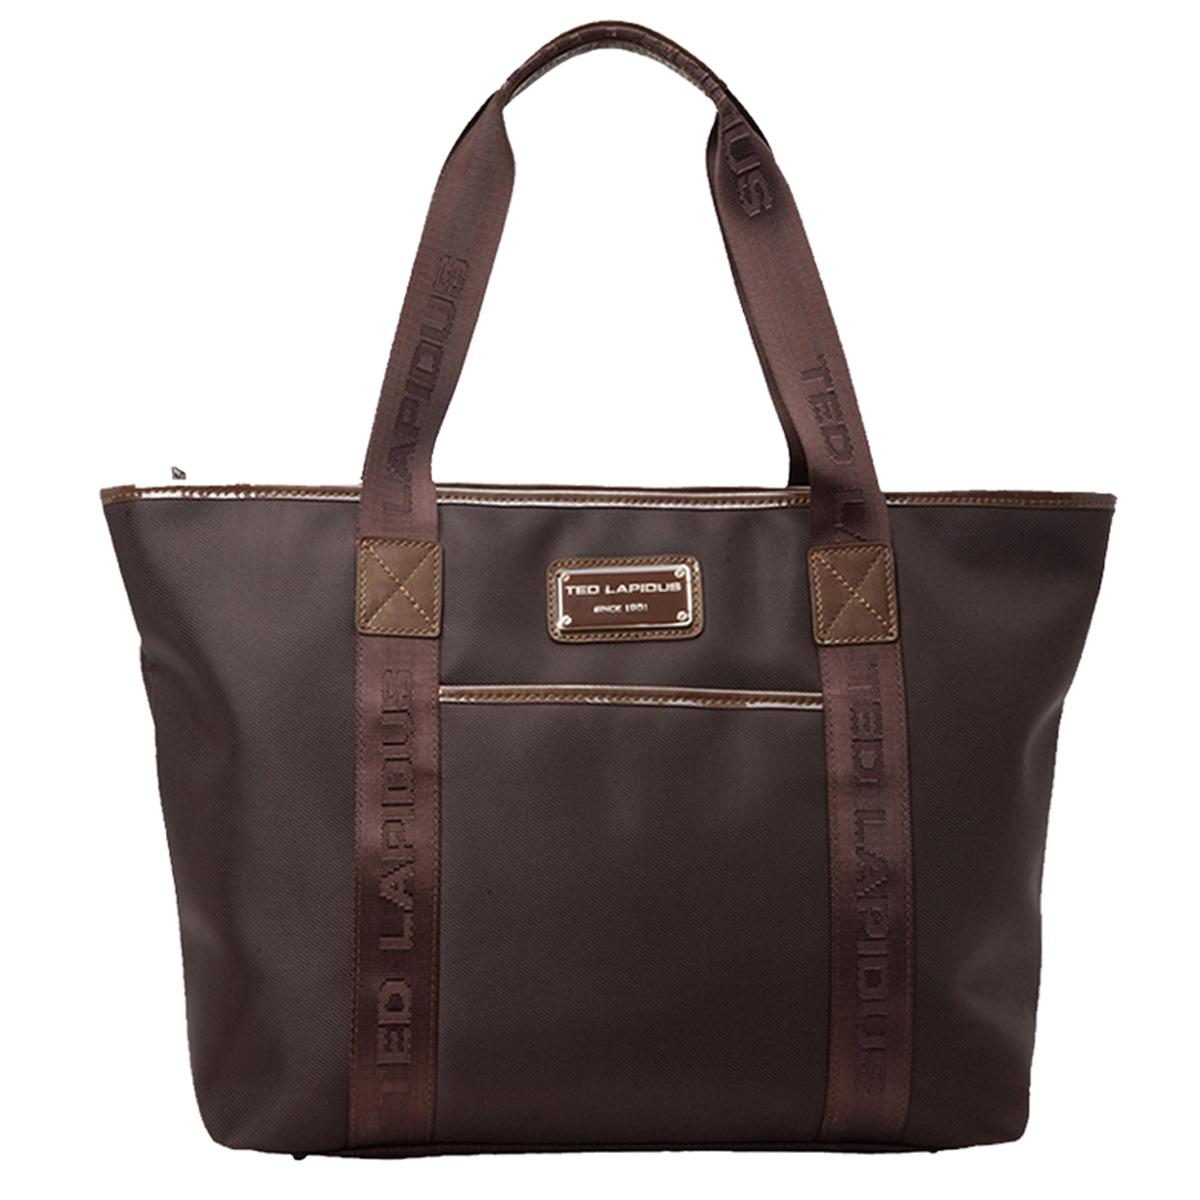 Sac shopping \'Ted lapidus\' marron  - 47x28x16 cm - [L2725]